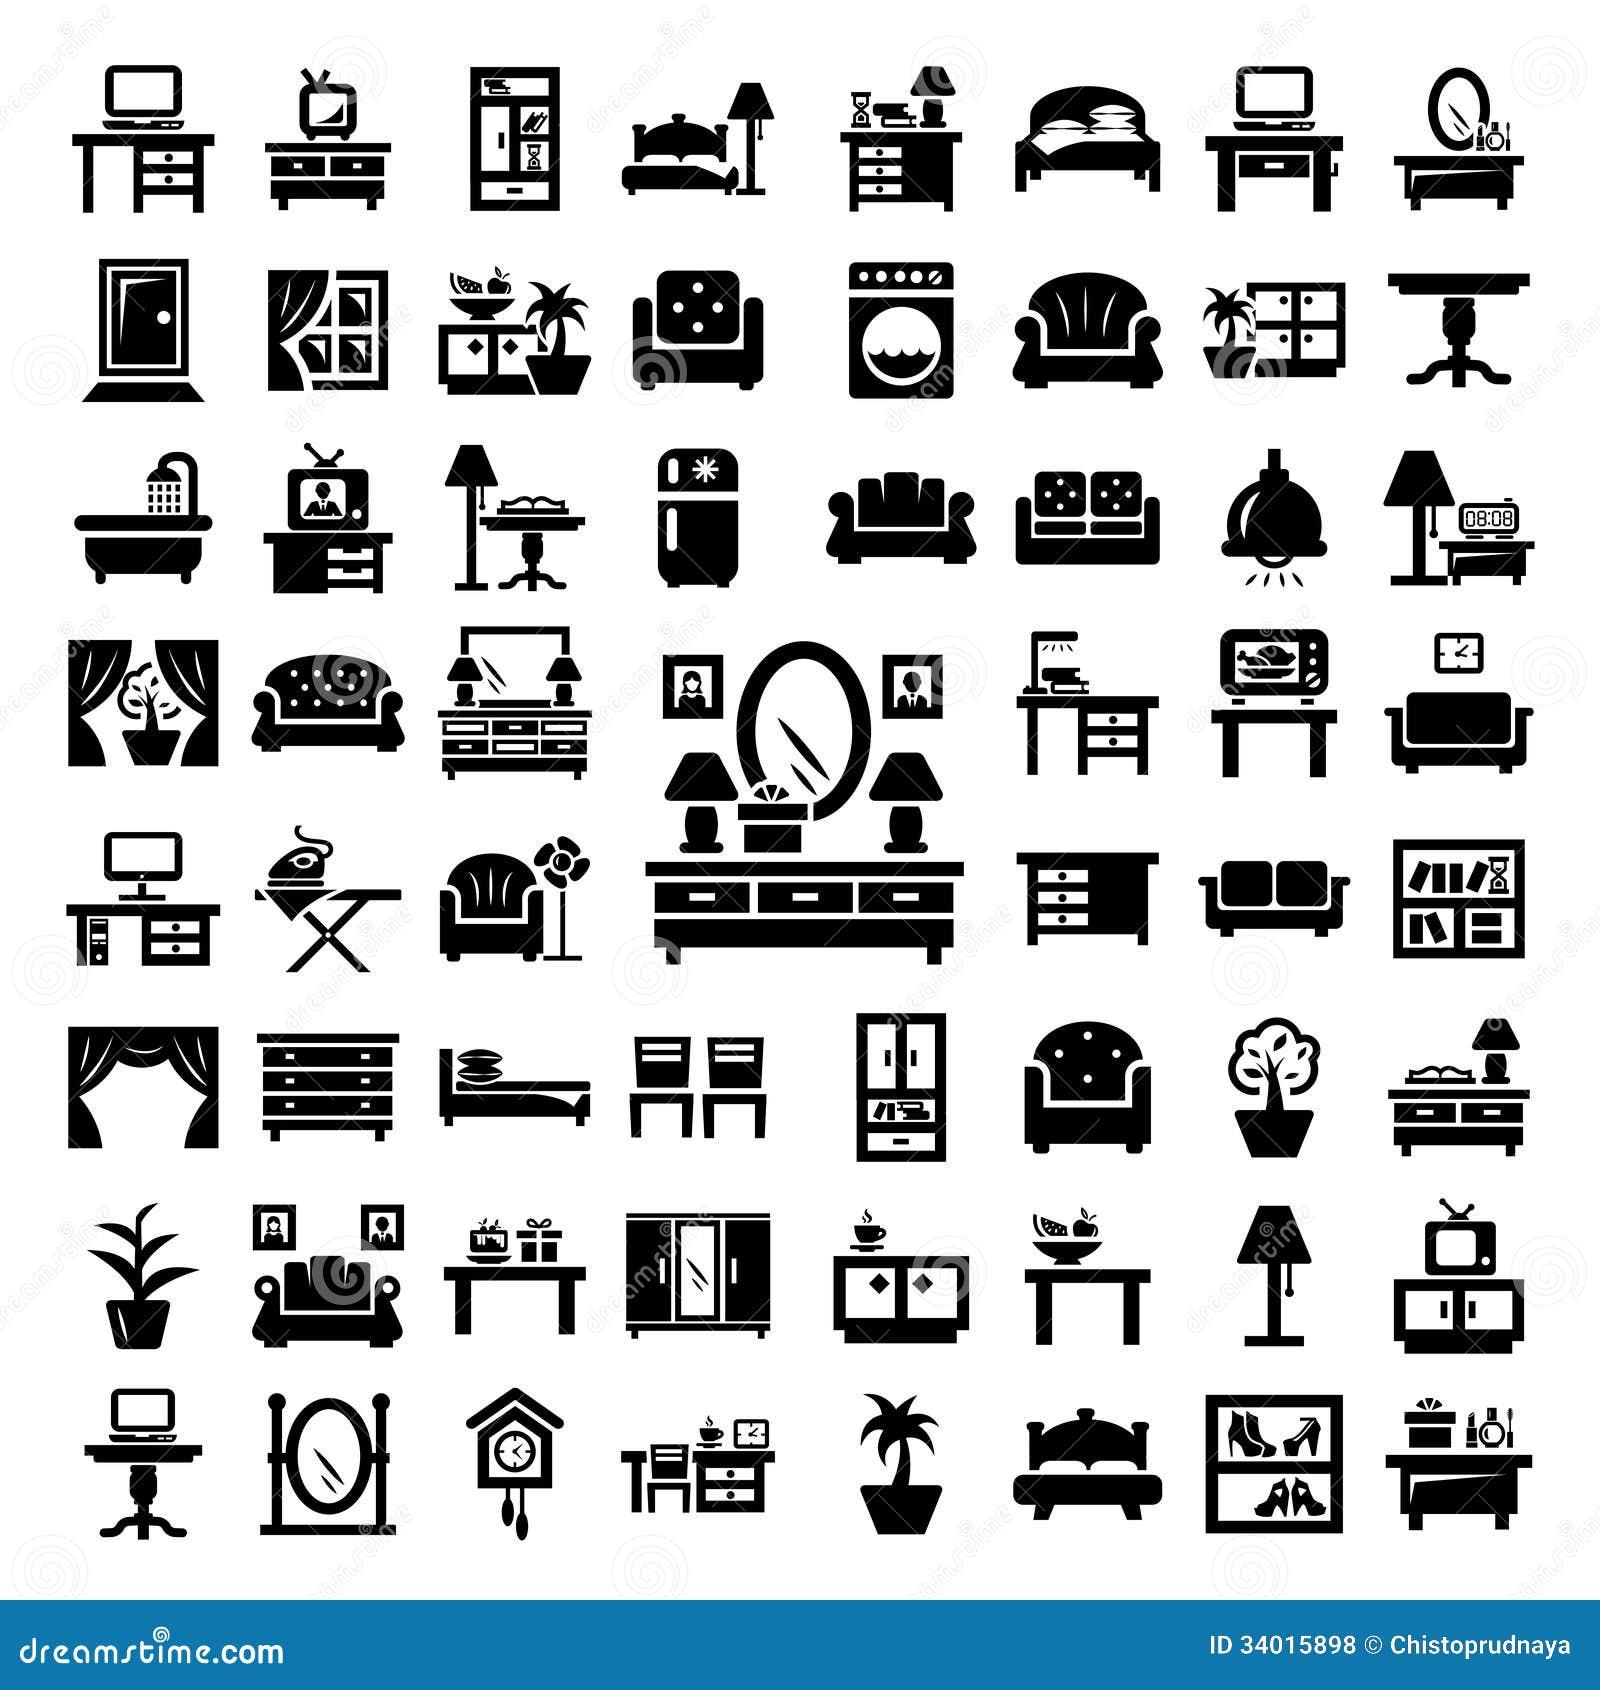 Big Furniture Icons Set Royalty Free Stock Photos Image 34015898